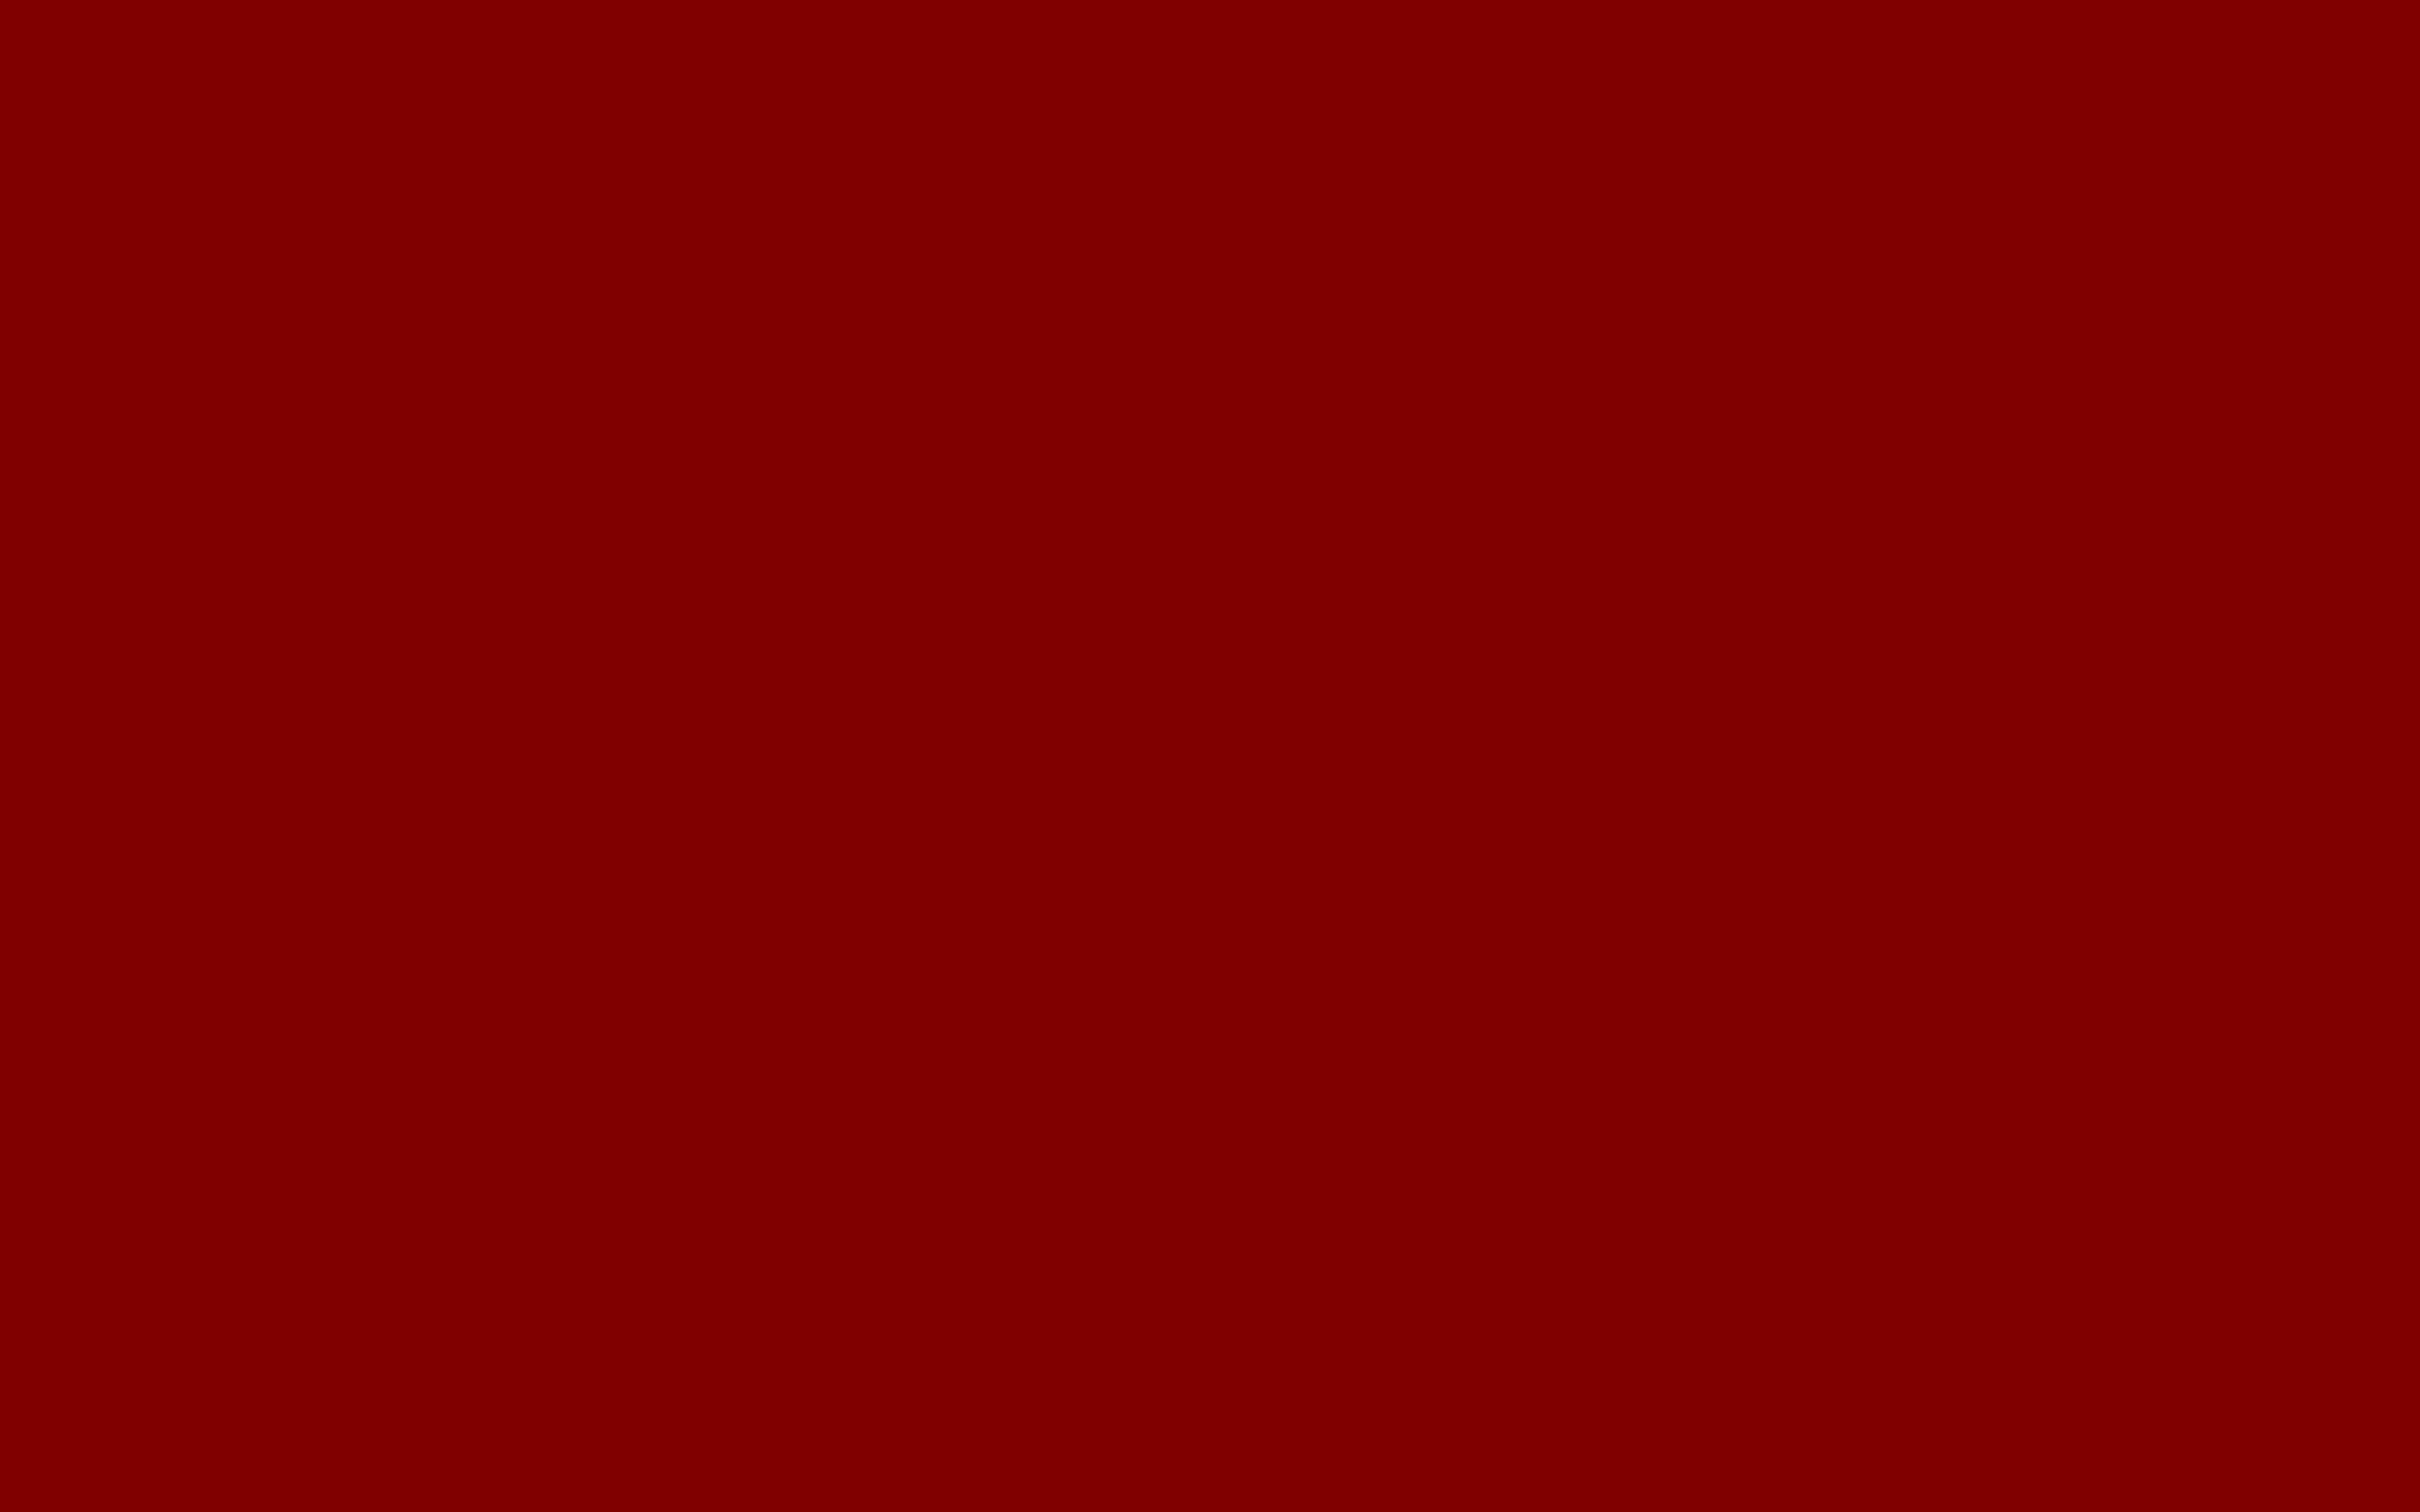 Maroon wallpaper – Latest Wallpaper Trend!